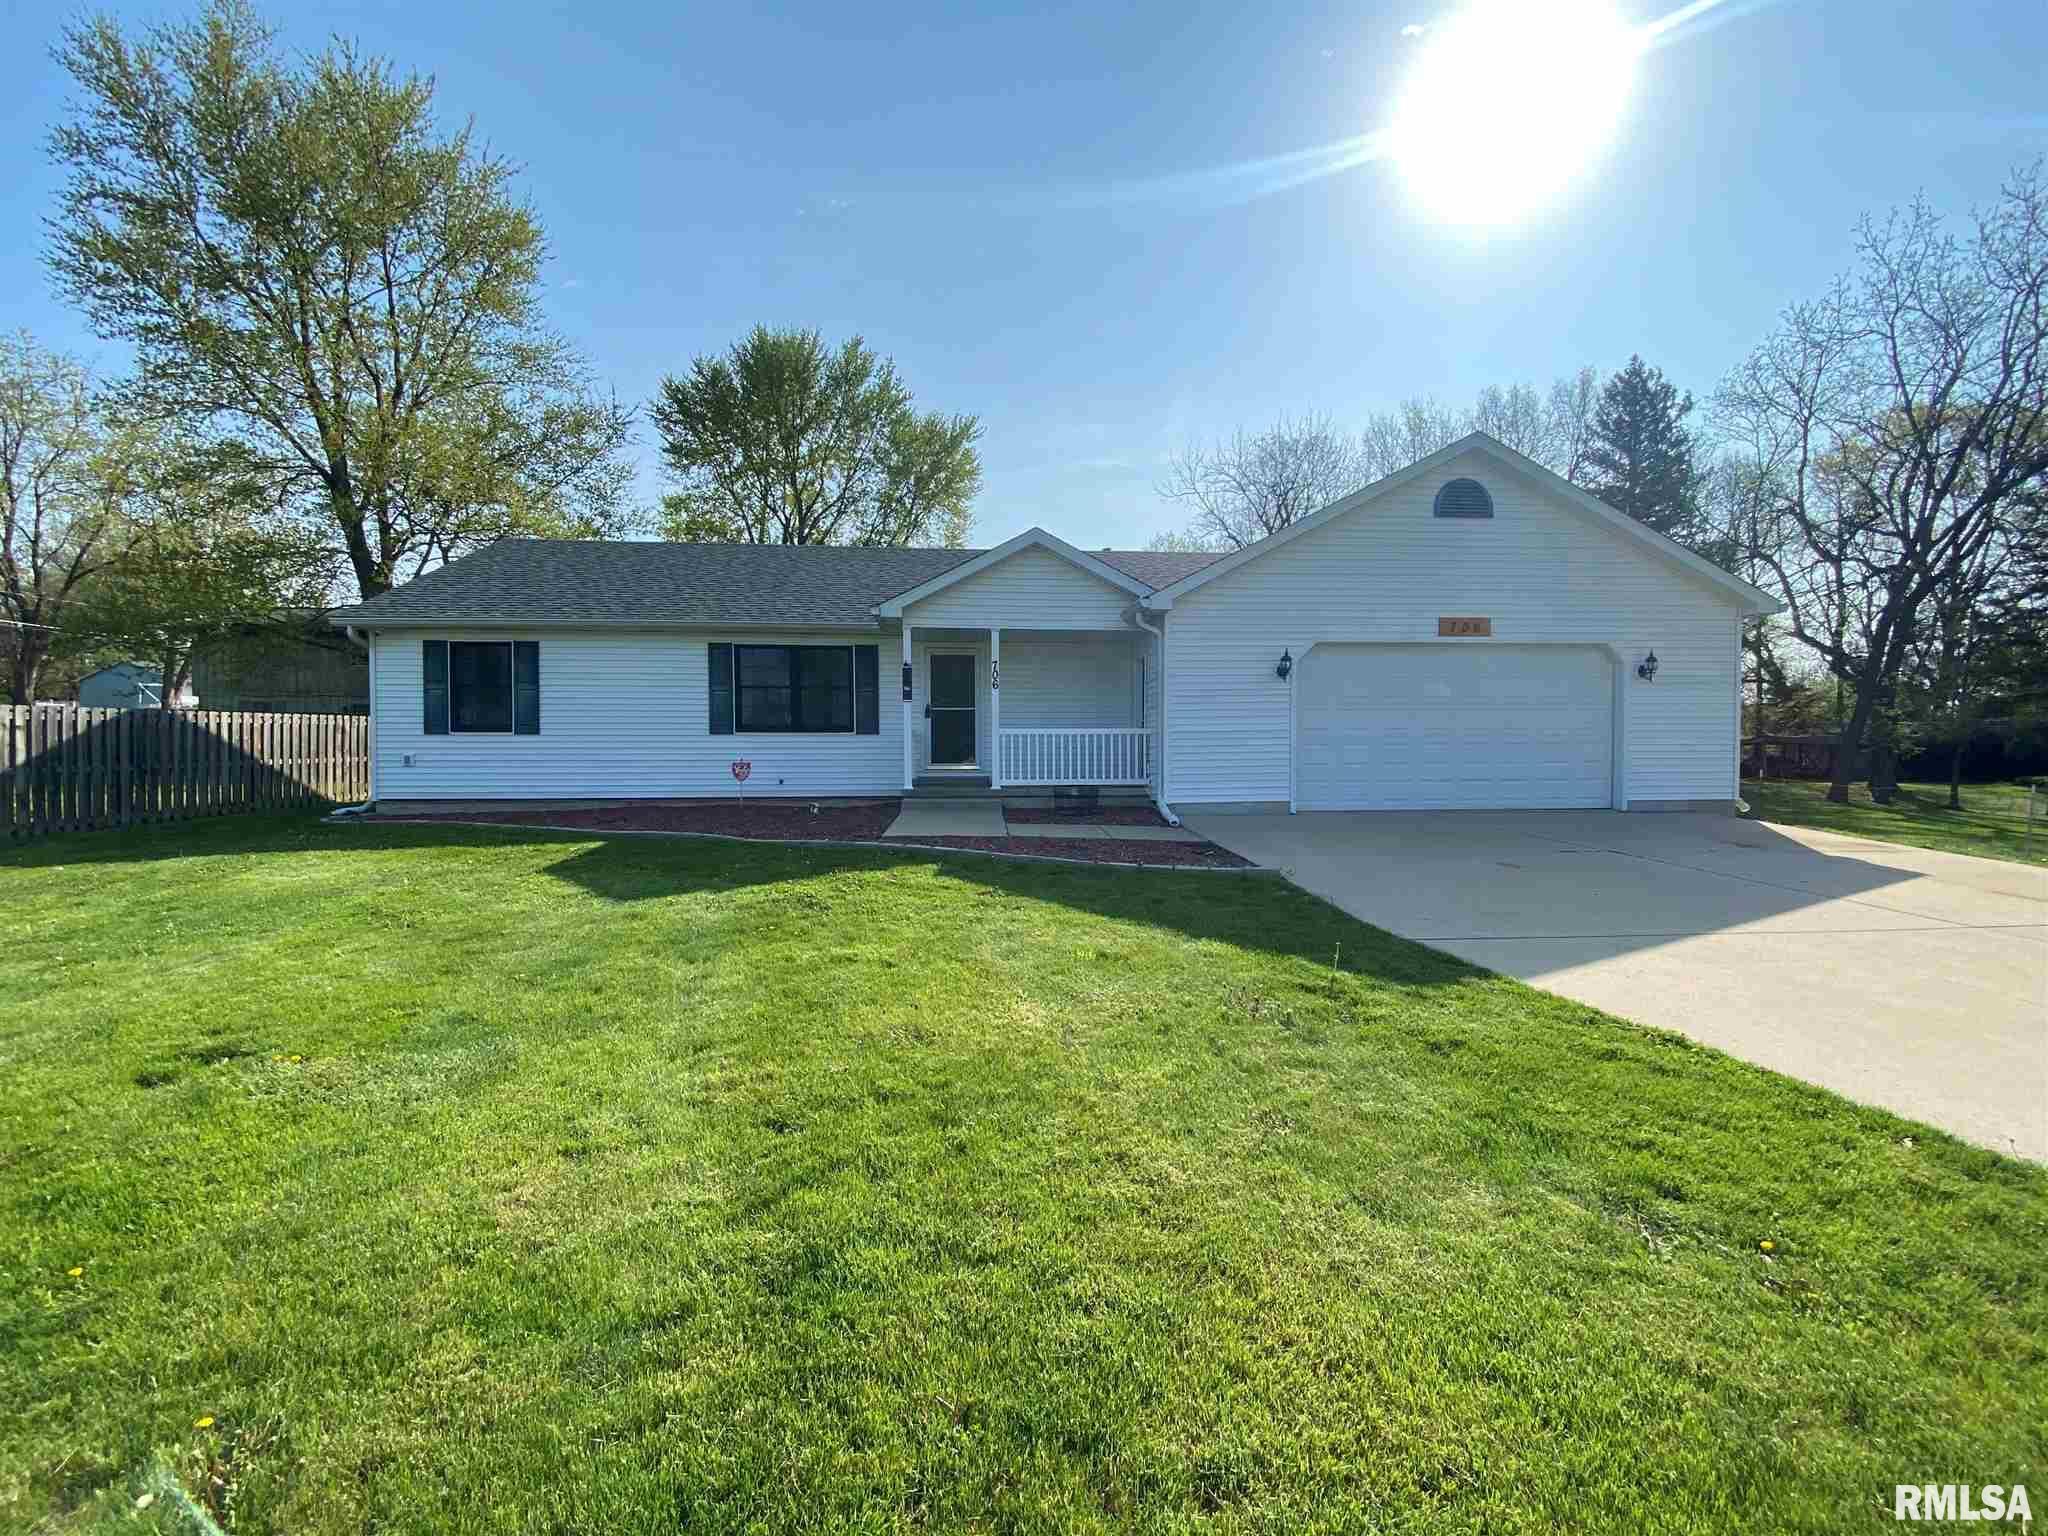 706 N 5TH Property Photo - Riverton, IL real estate listing